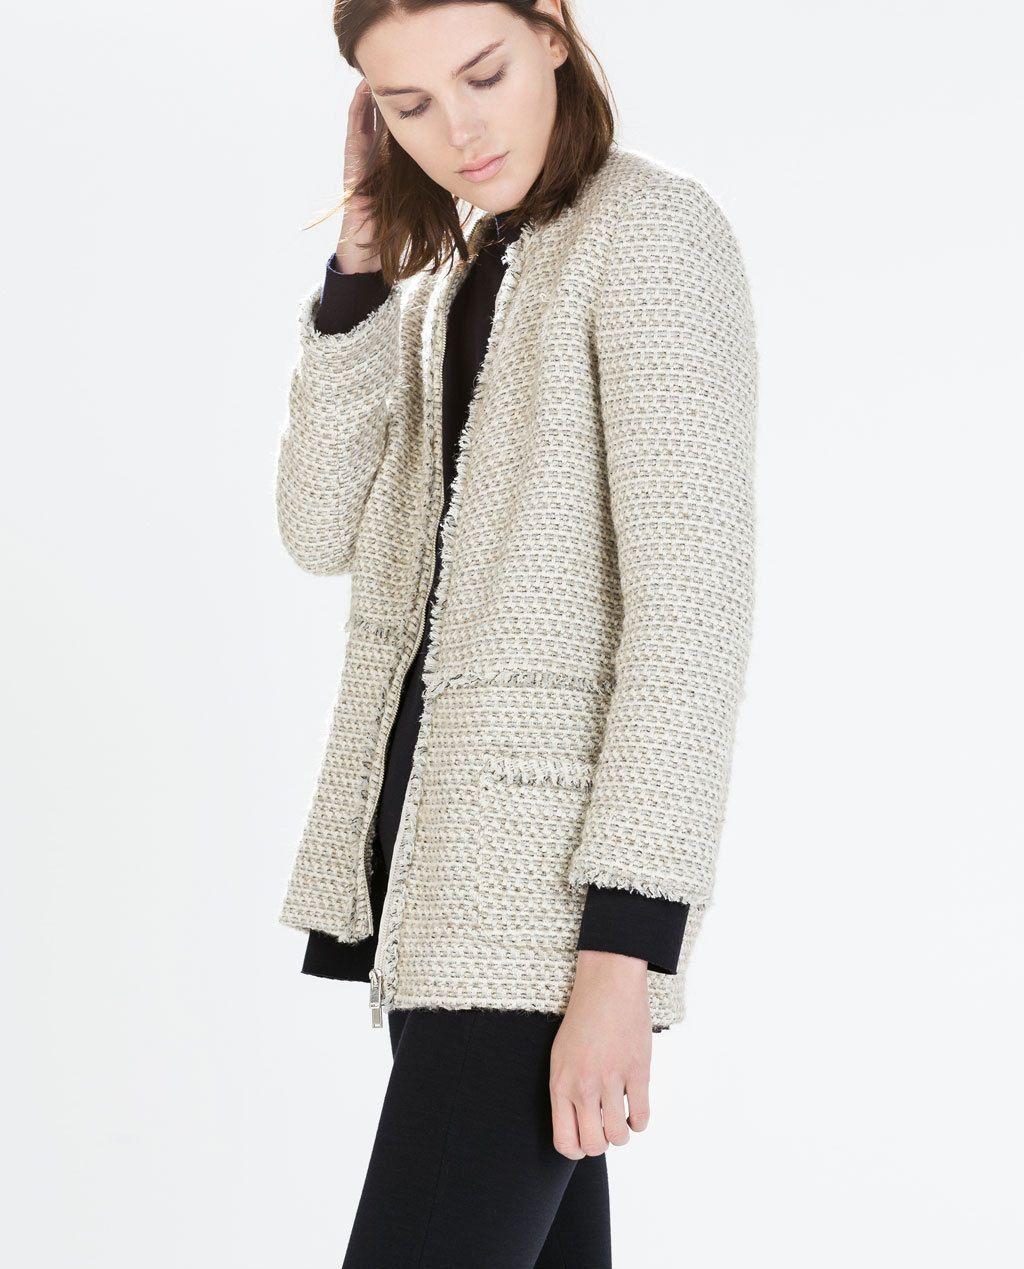 Zara Ecru Frayed Edge Textured Long Blazer - Beautiful Wardrobe